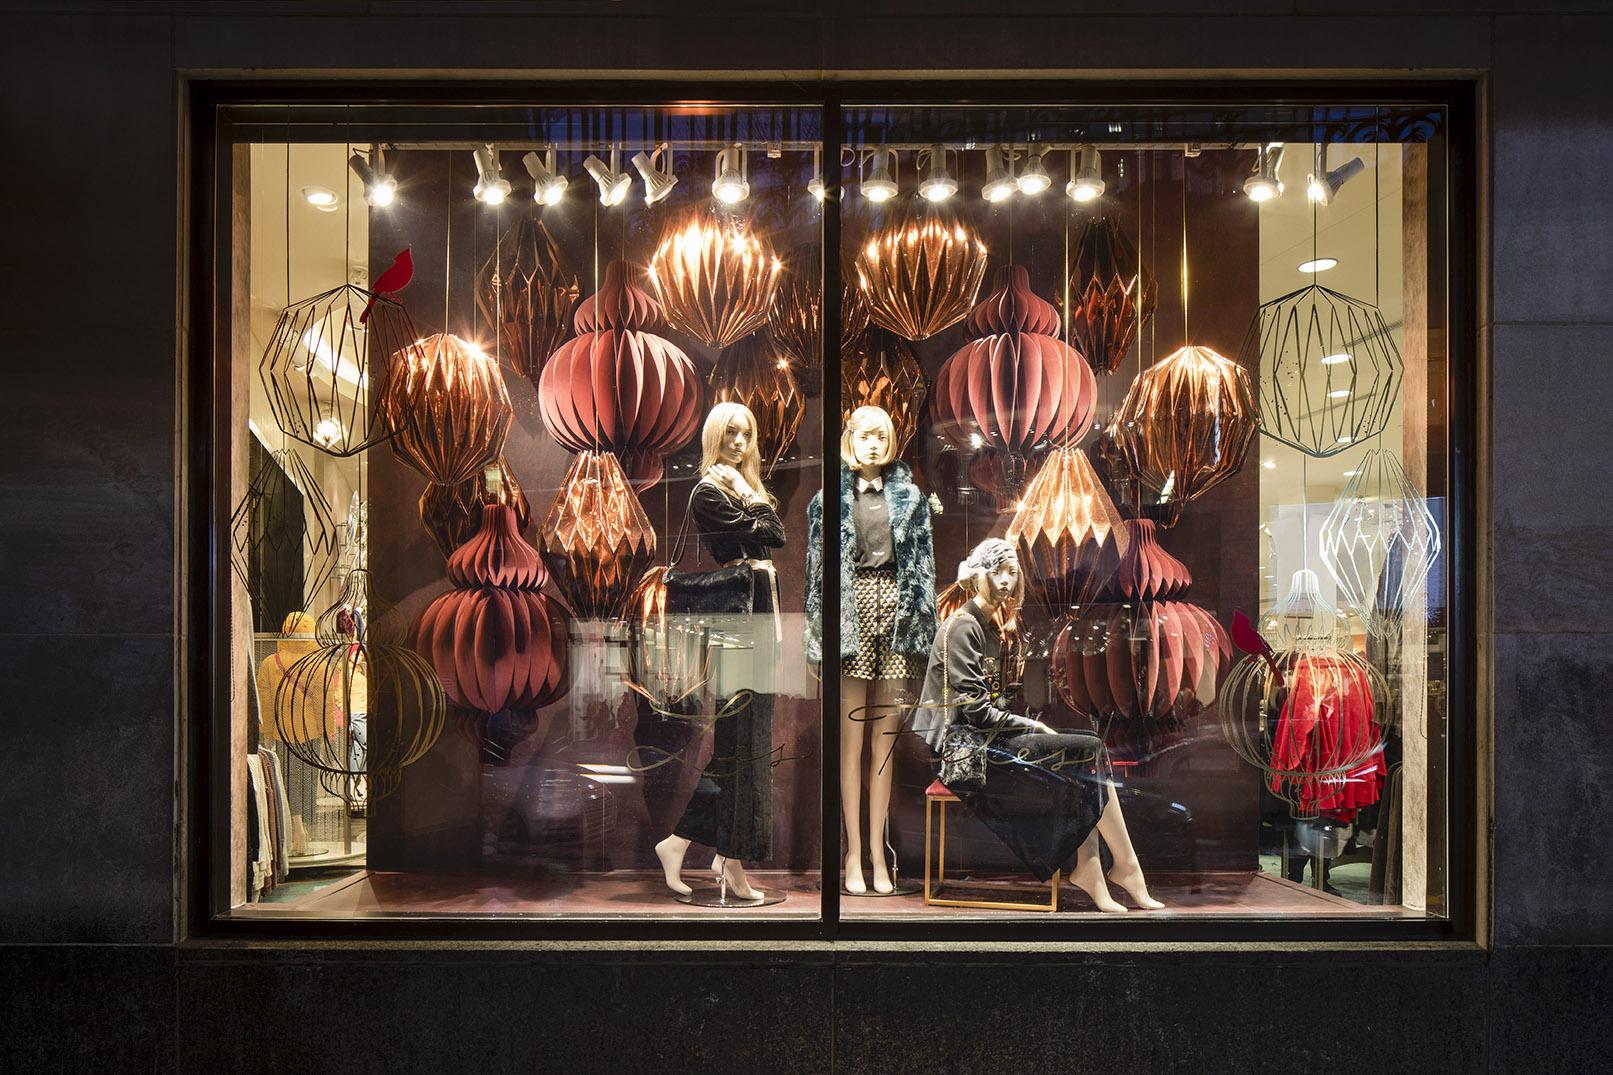 miss-cloudy-maison-simons-christmas-window-display-origami-paper-art-folding-pauline-locti-5.jpg